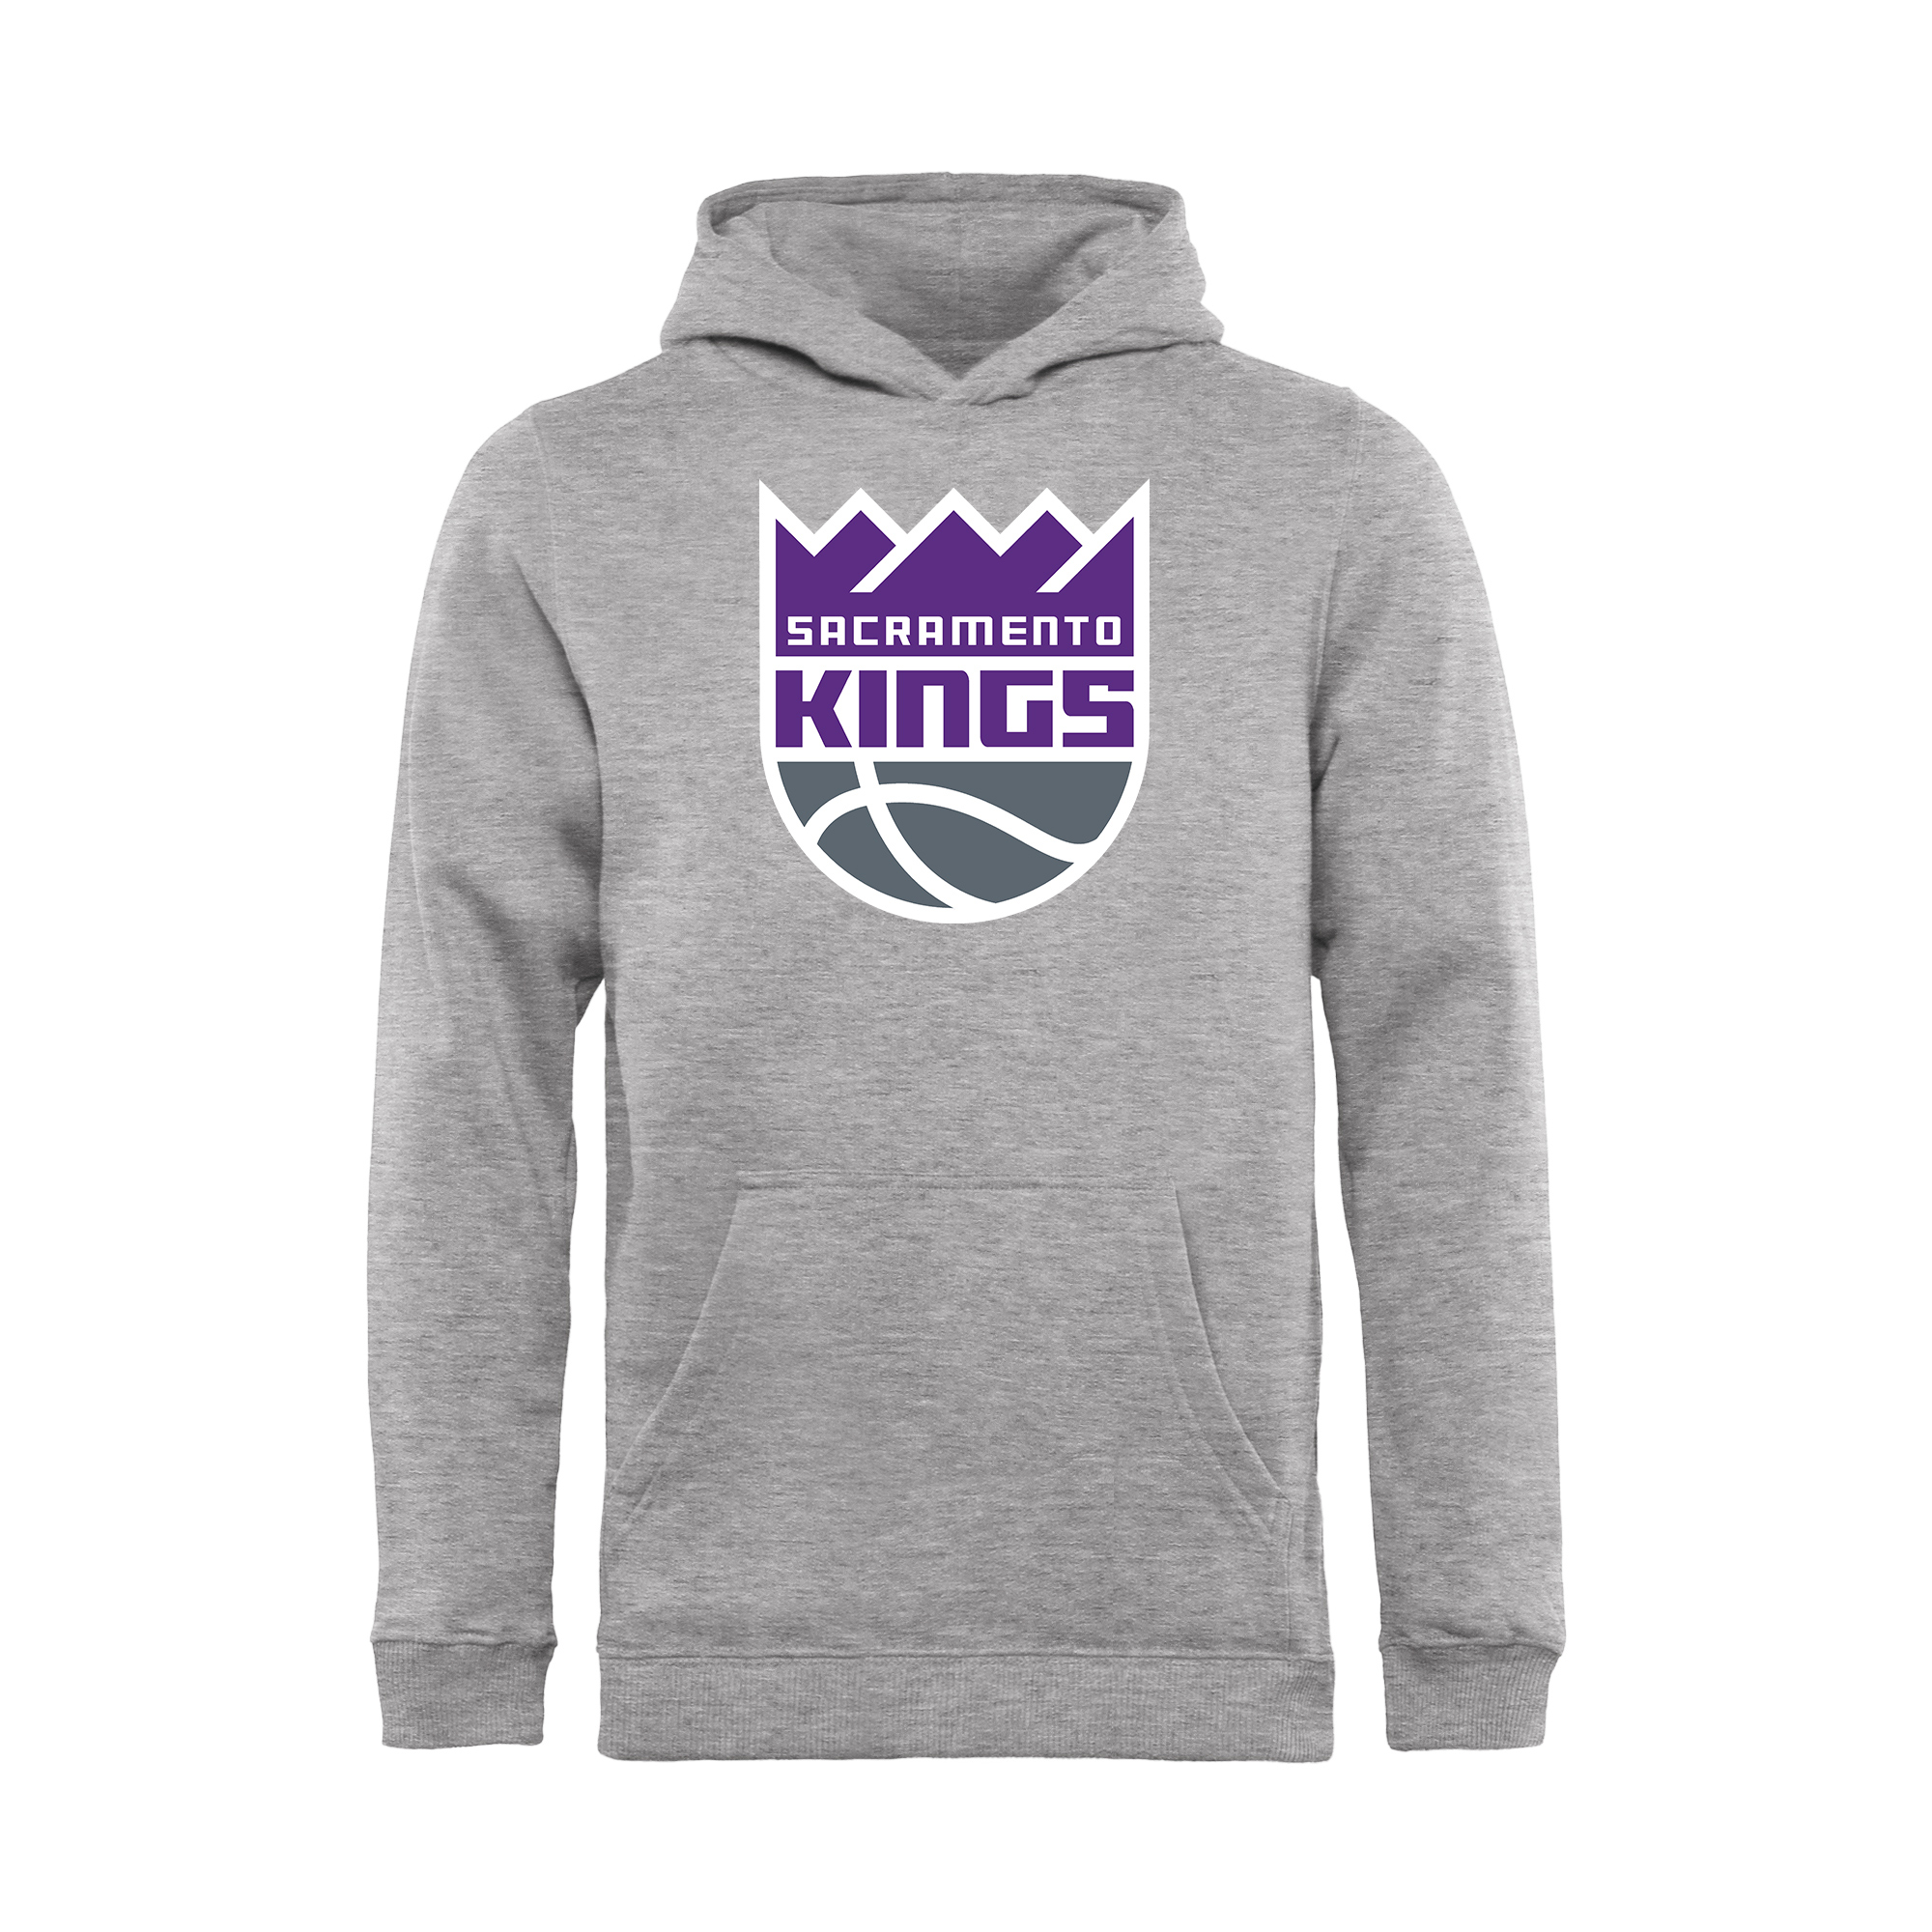 Sacramento Kings Fanatics Branded Youth Primary Logo Pullover Hoodie - Heathered Gray